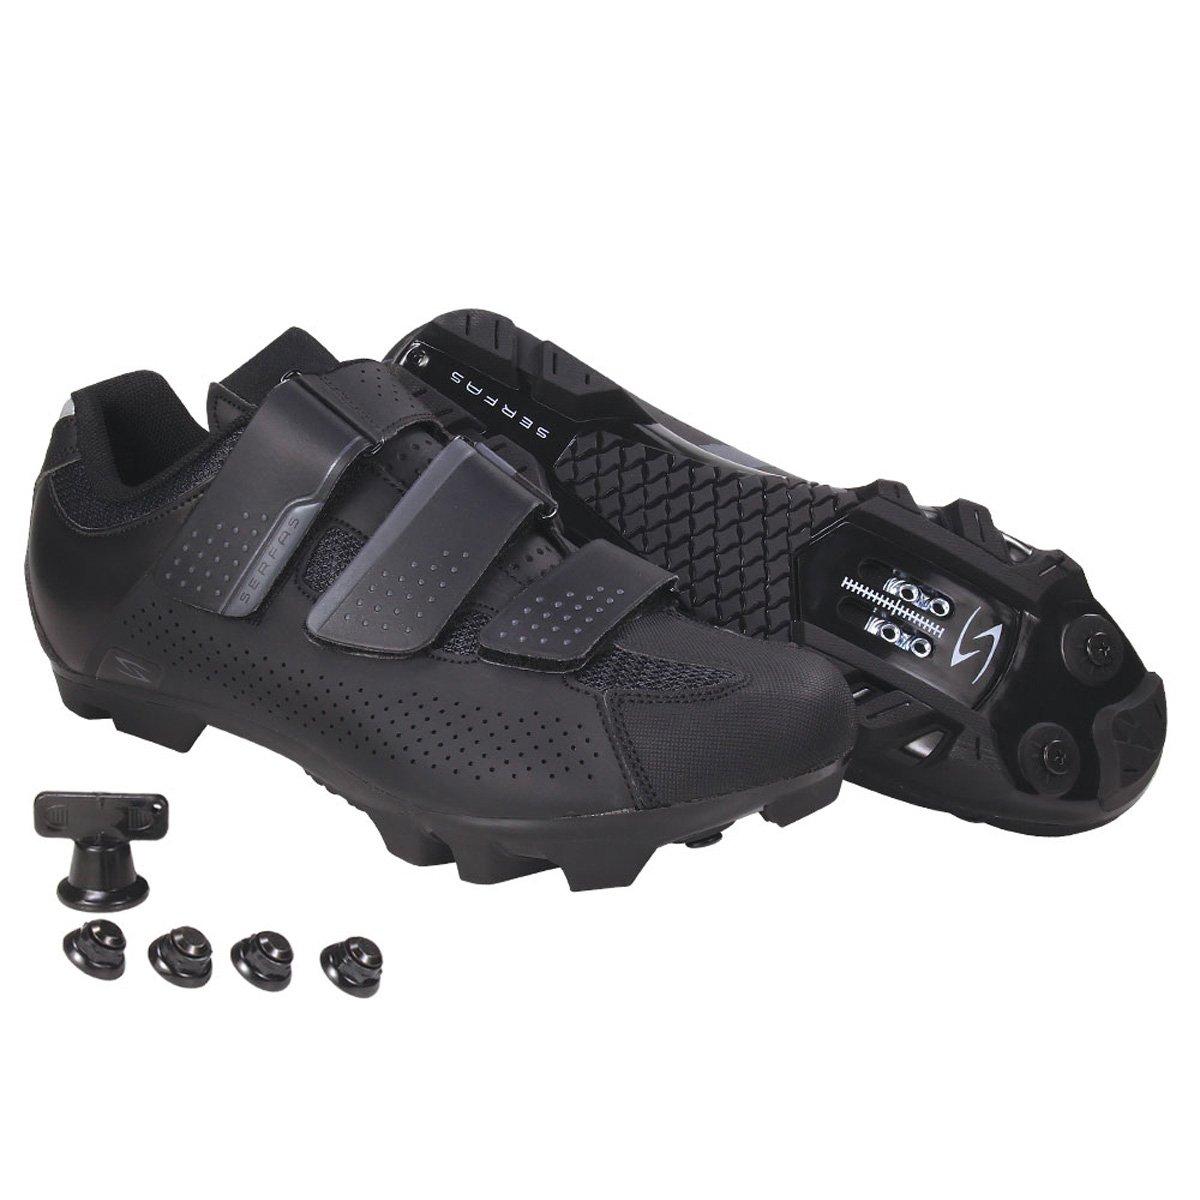 SerfasレディースMTBマウンテンSingletrack 3-strap SPDマウンテンバイクサイクリング靴 ブラック   B077GBQZ95